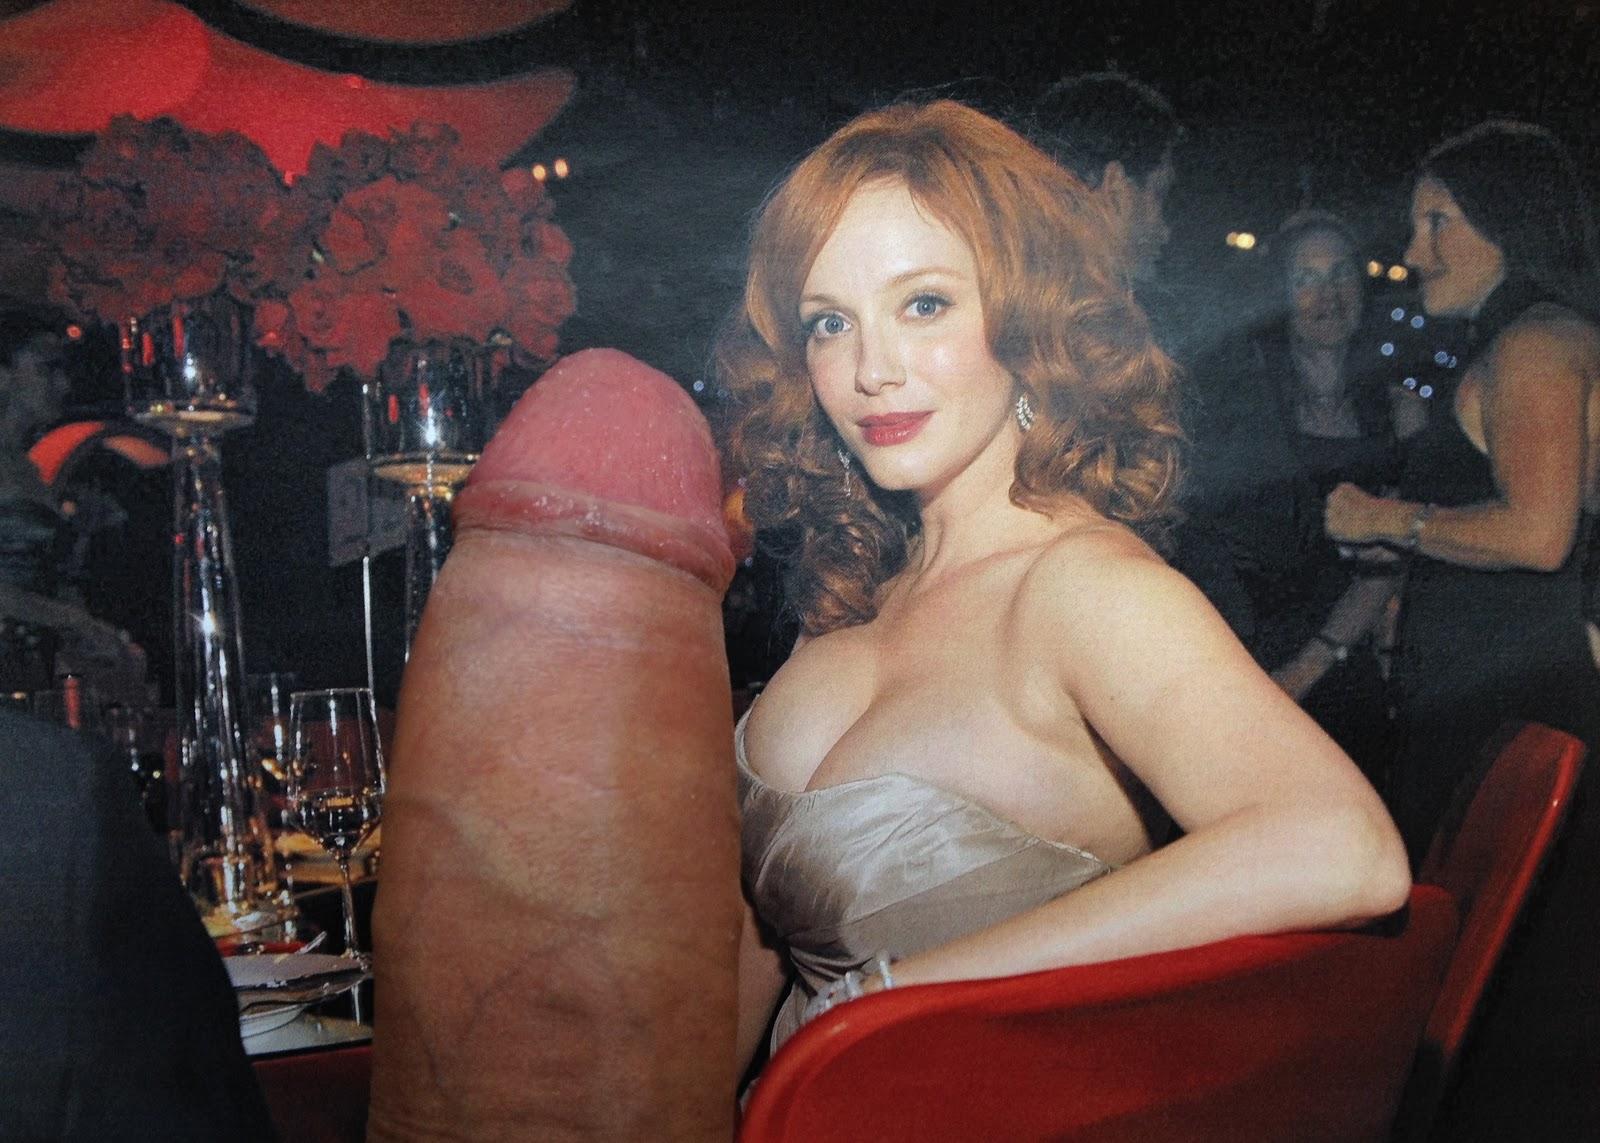 Xxx Female orgasm denial free mobile porn sex videos